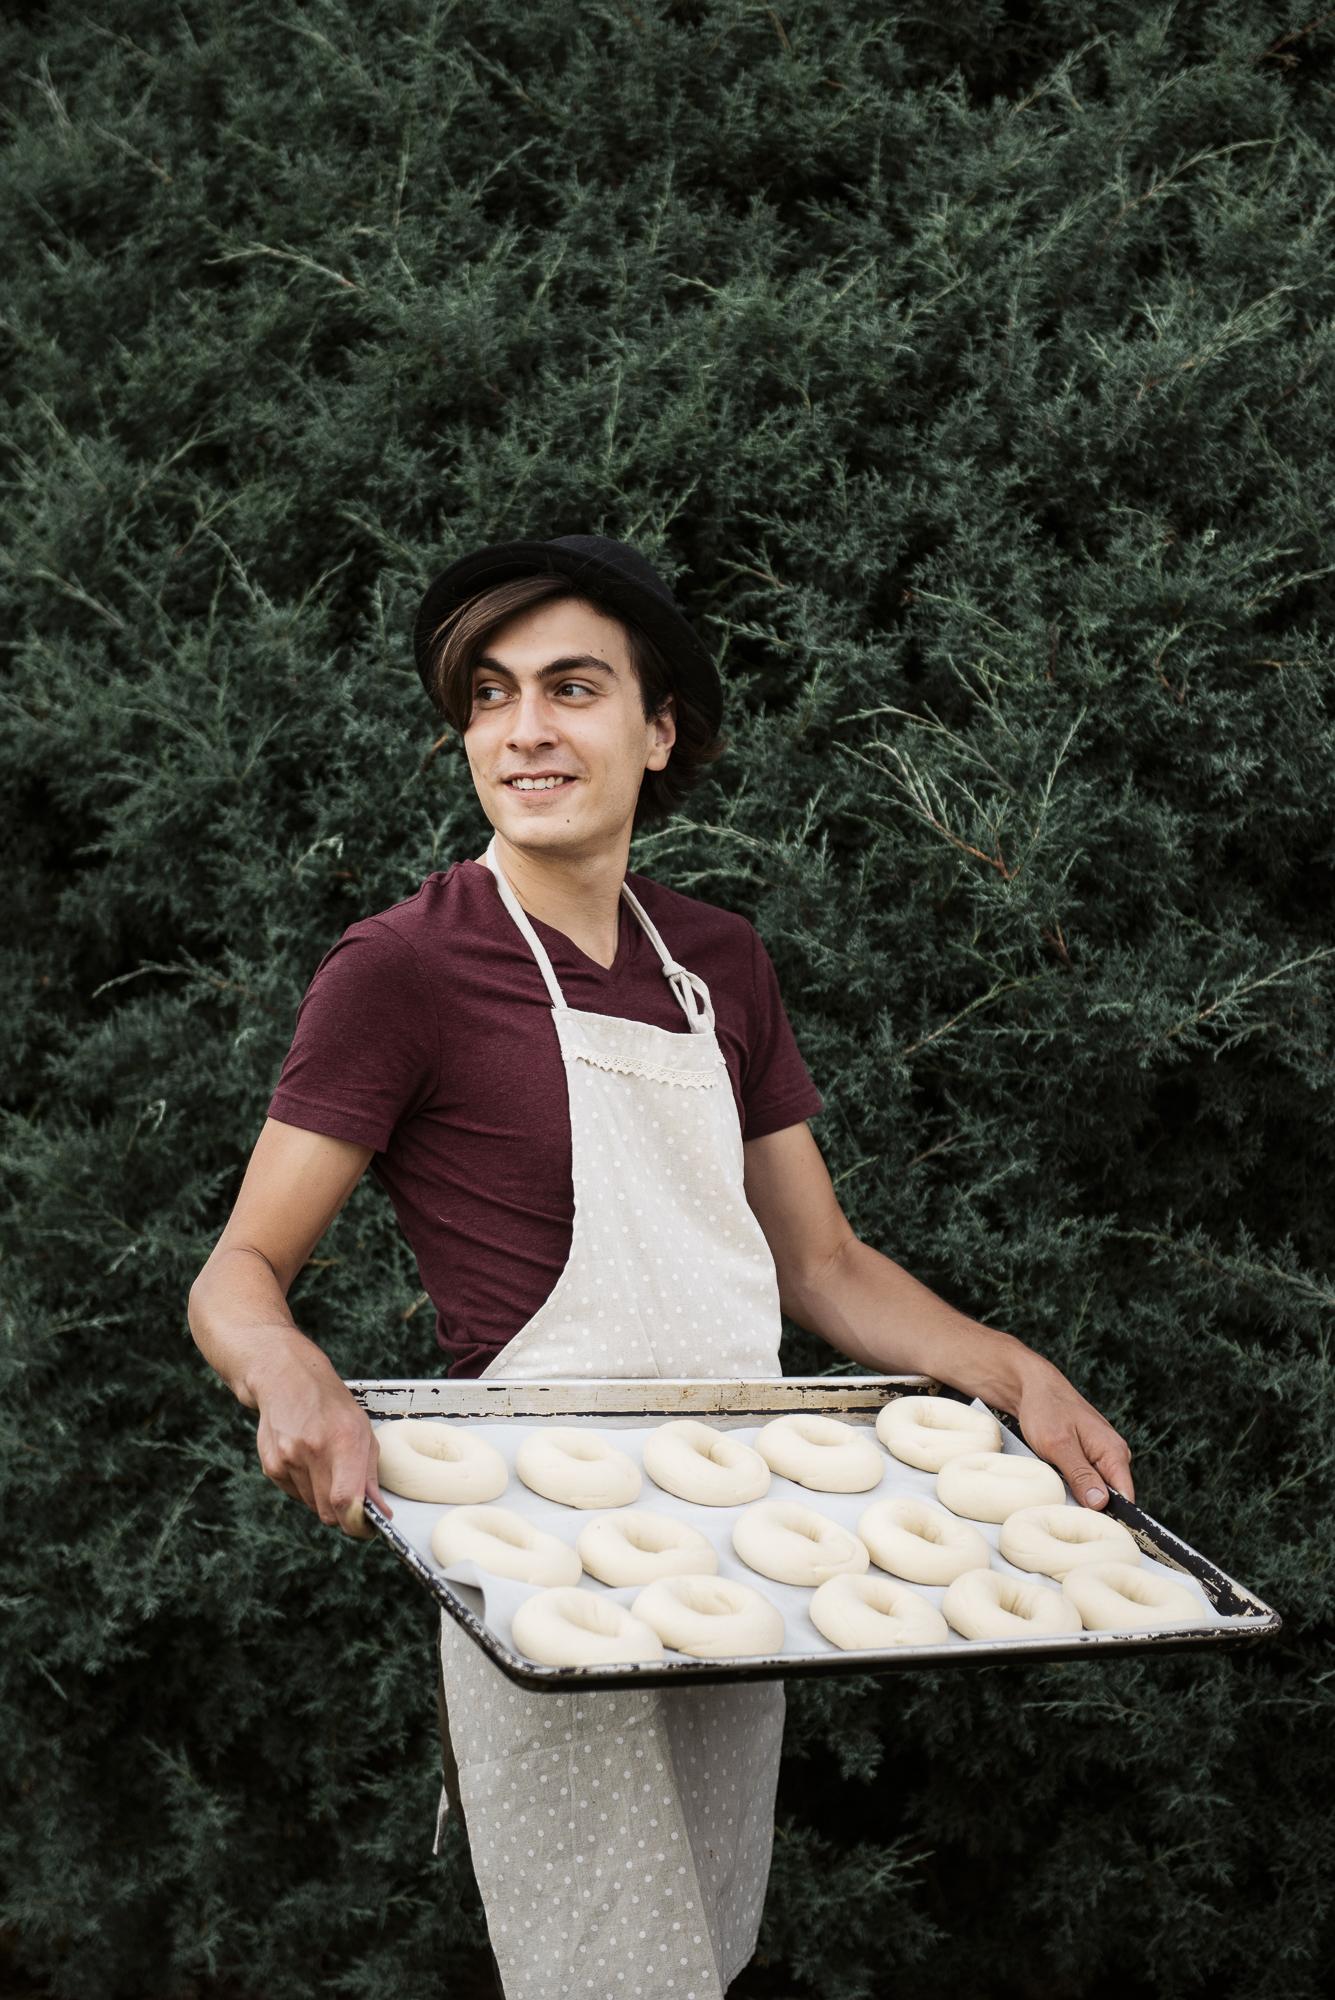 Home Free Bagels  Jack Sorokin Flame Food Photographer Asheville North Carolina NC Bakery Commercial Photography Alexander Blume